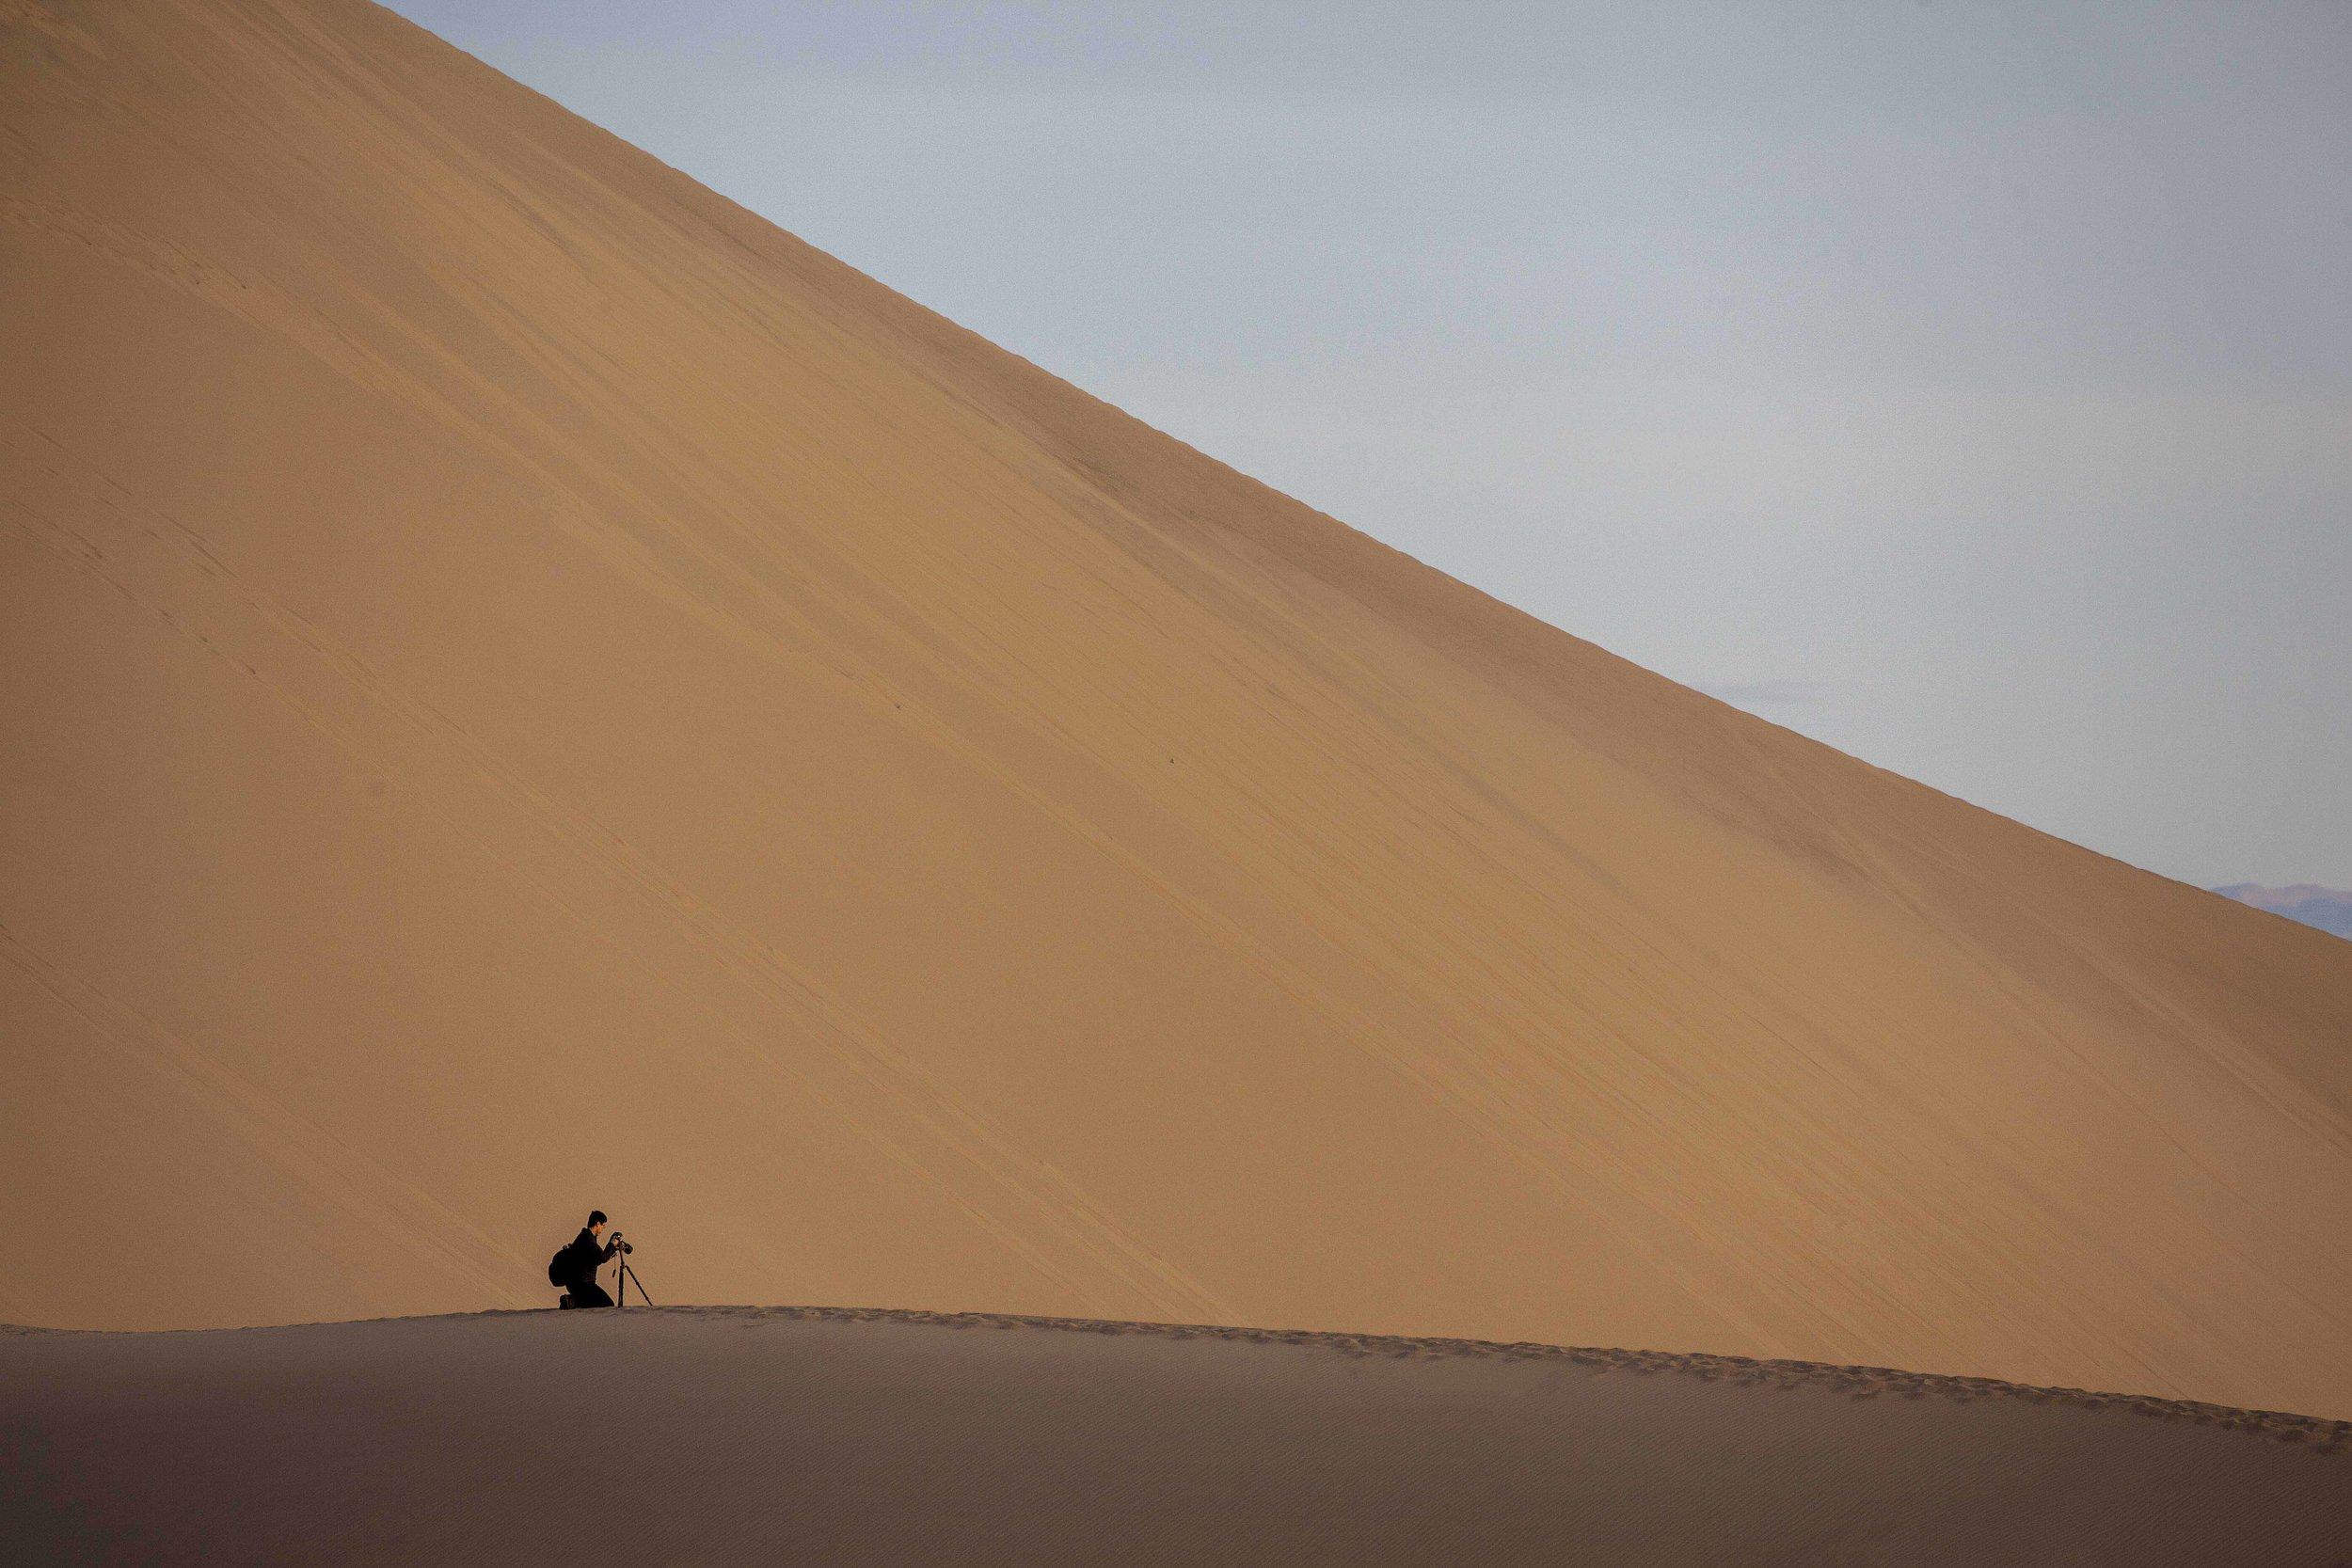 I_Dune sunrise photo dude_low res.jpg